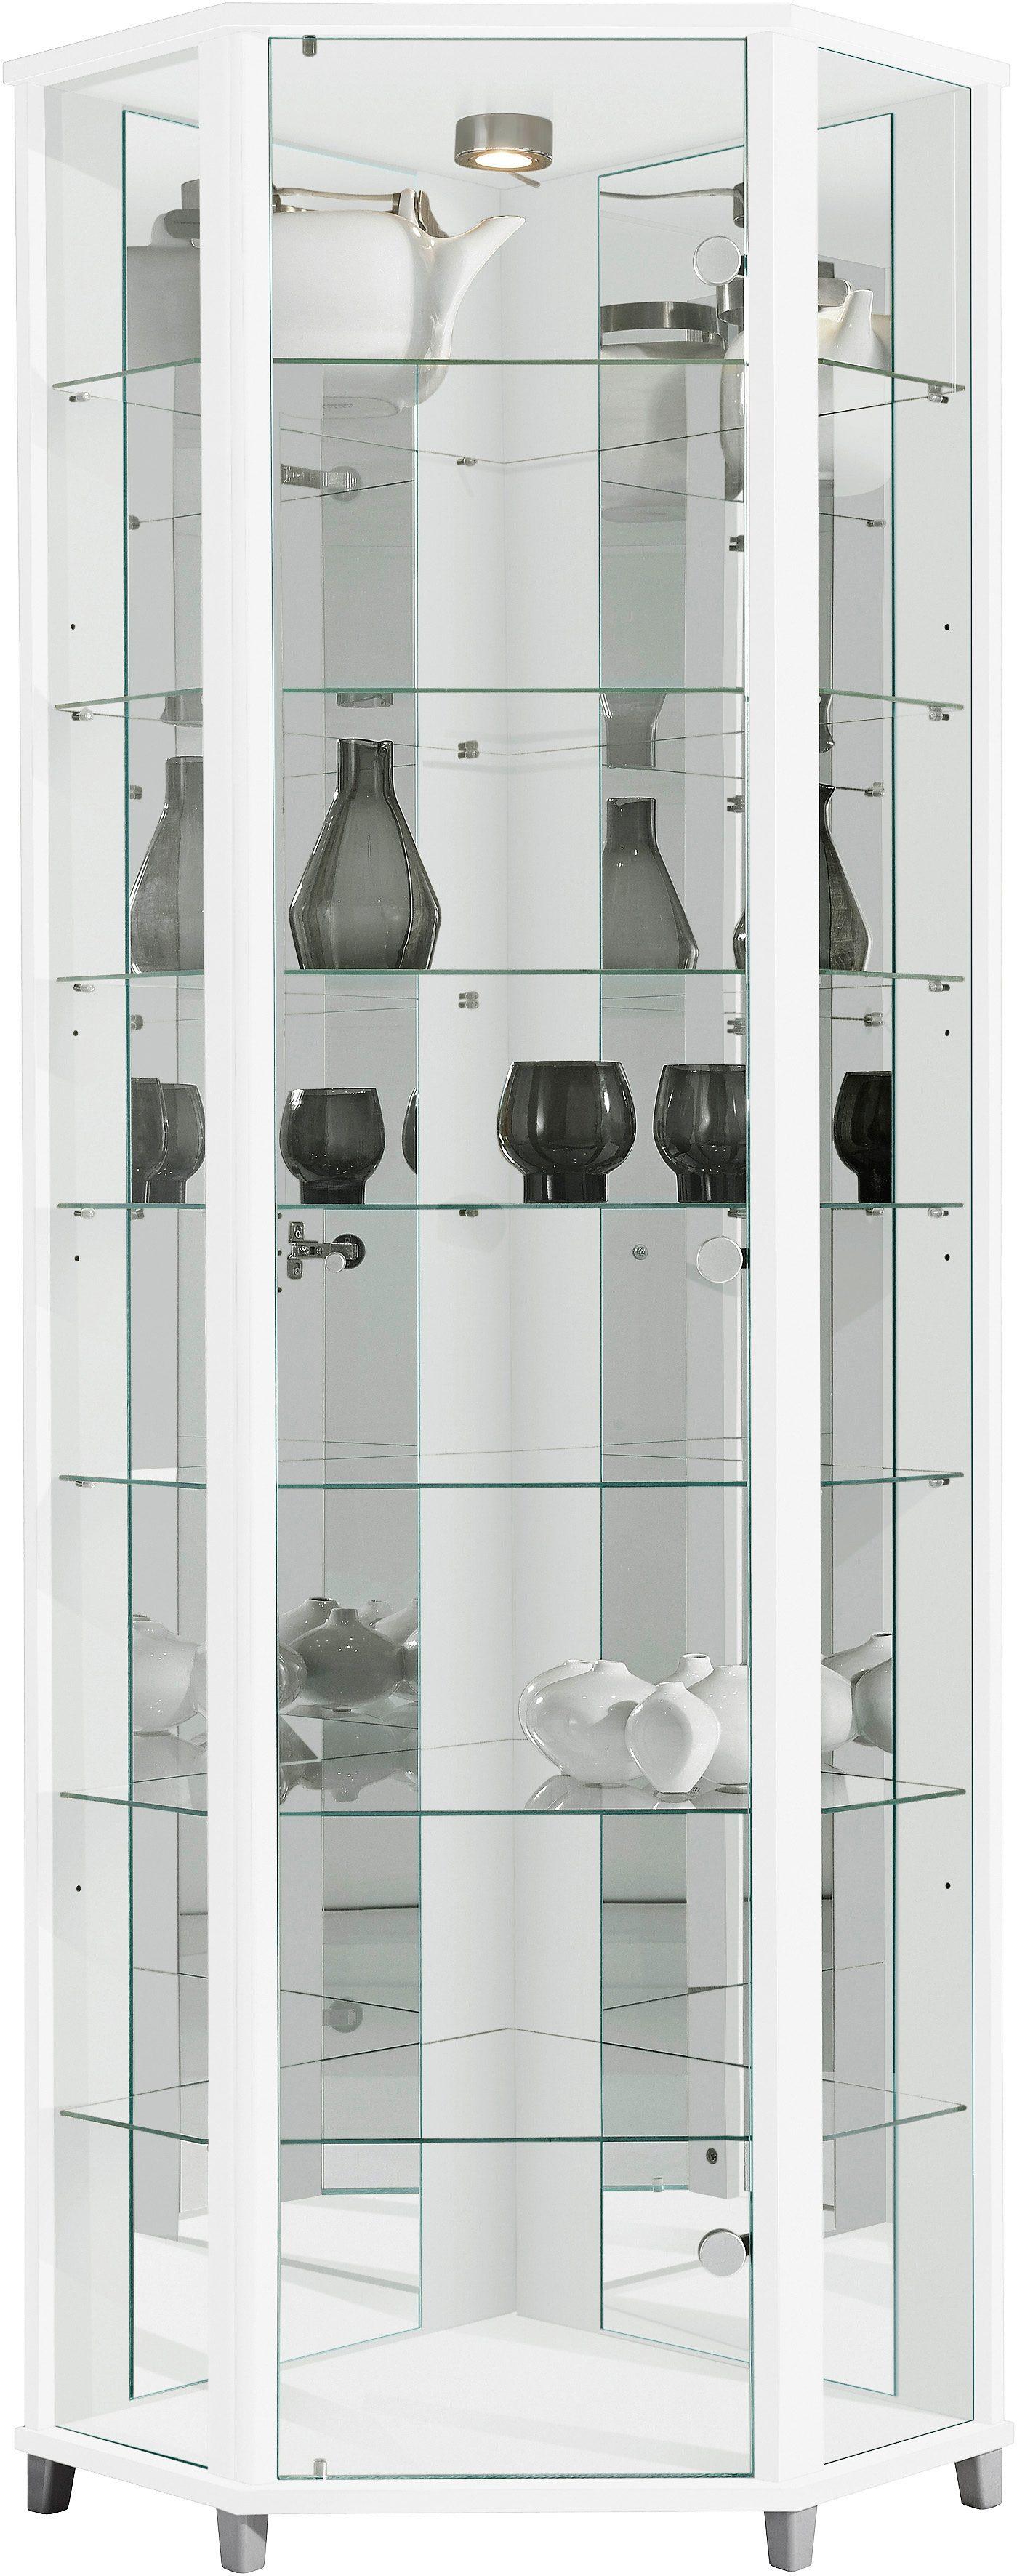 Eckvitrine, Höhe 172 cm, 7 Glasböden | Wohnzimmer > Vitrinen > Eckvitrinen | QUELLE